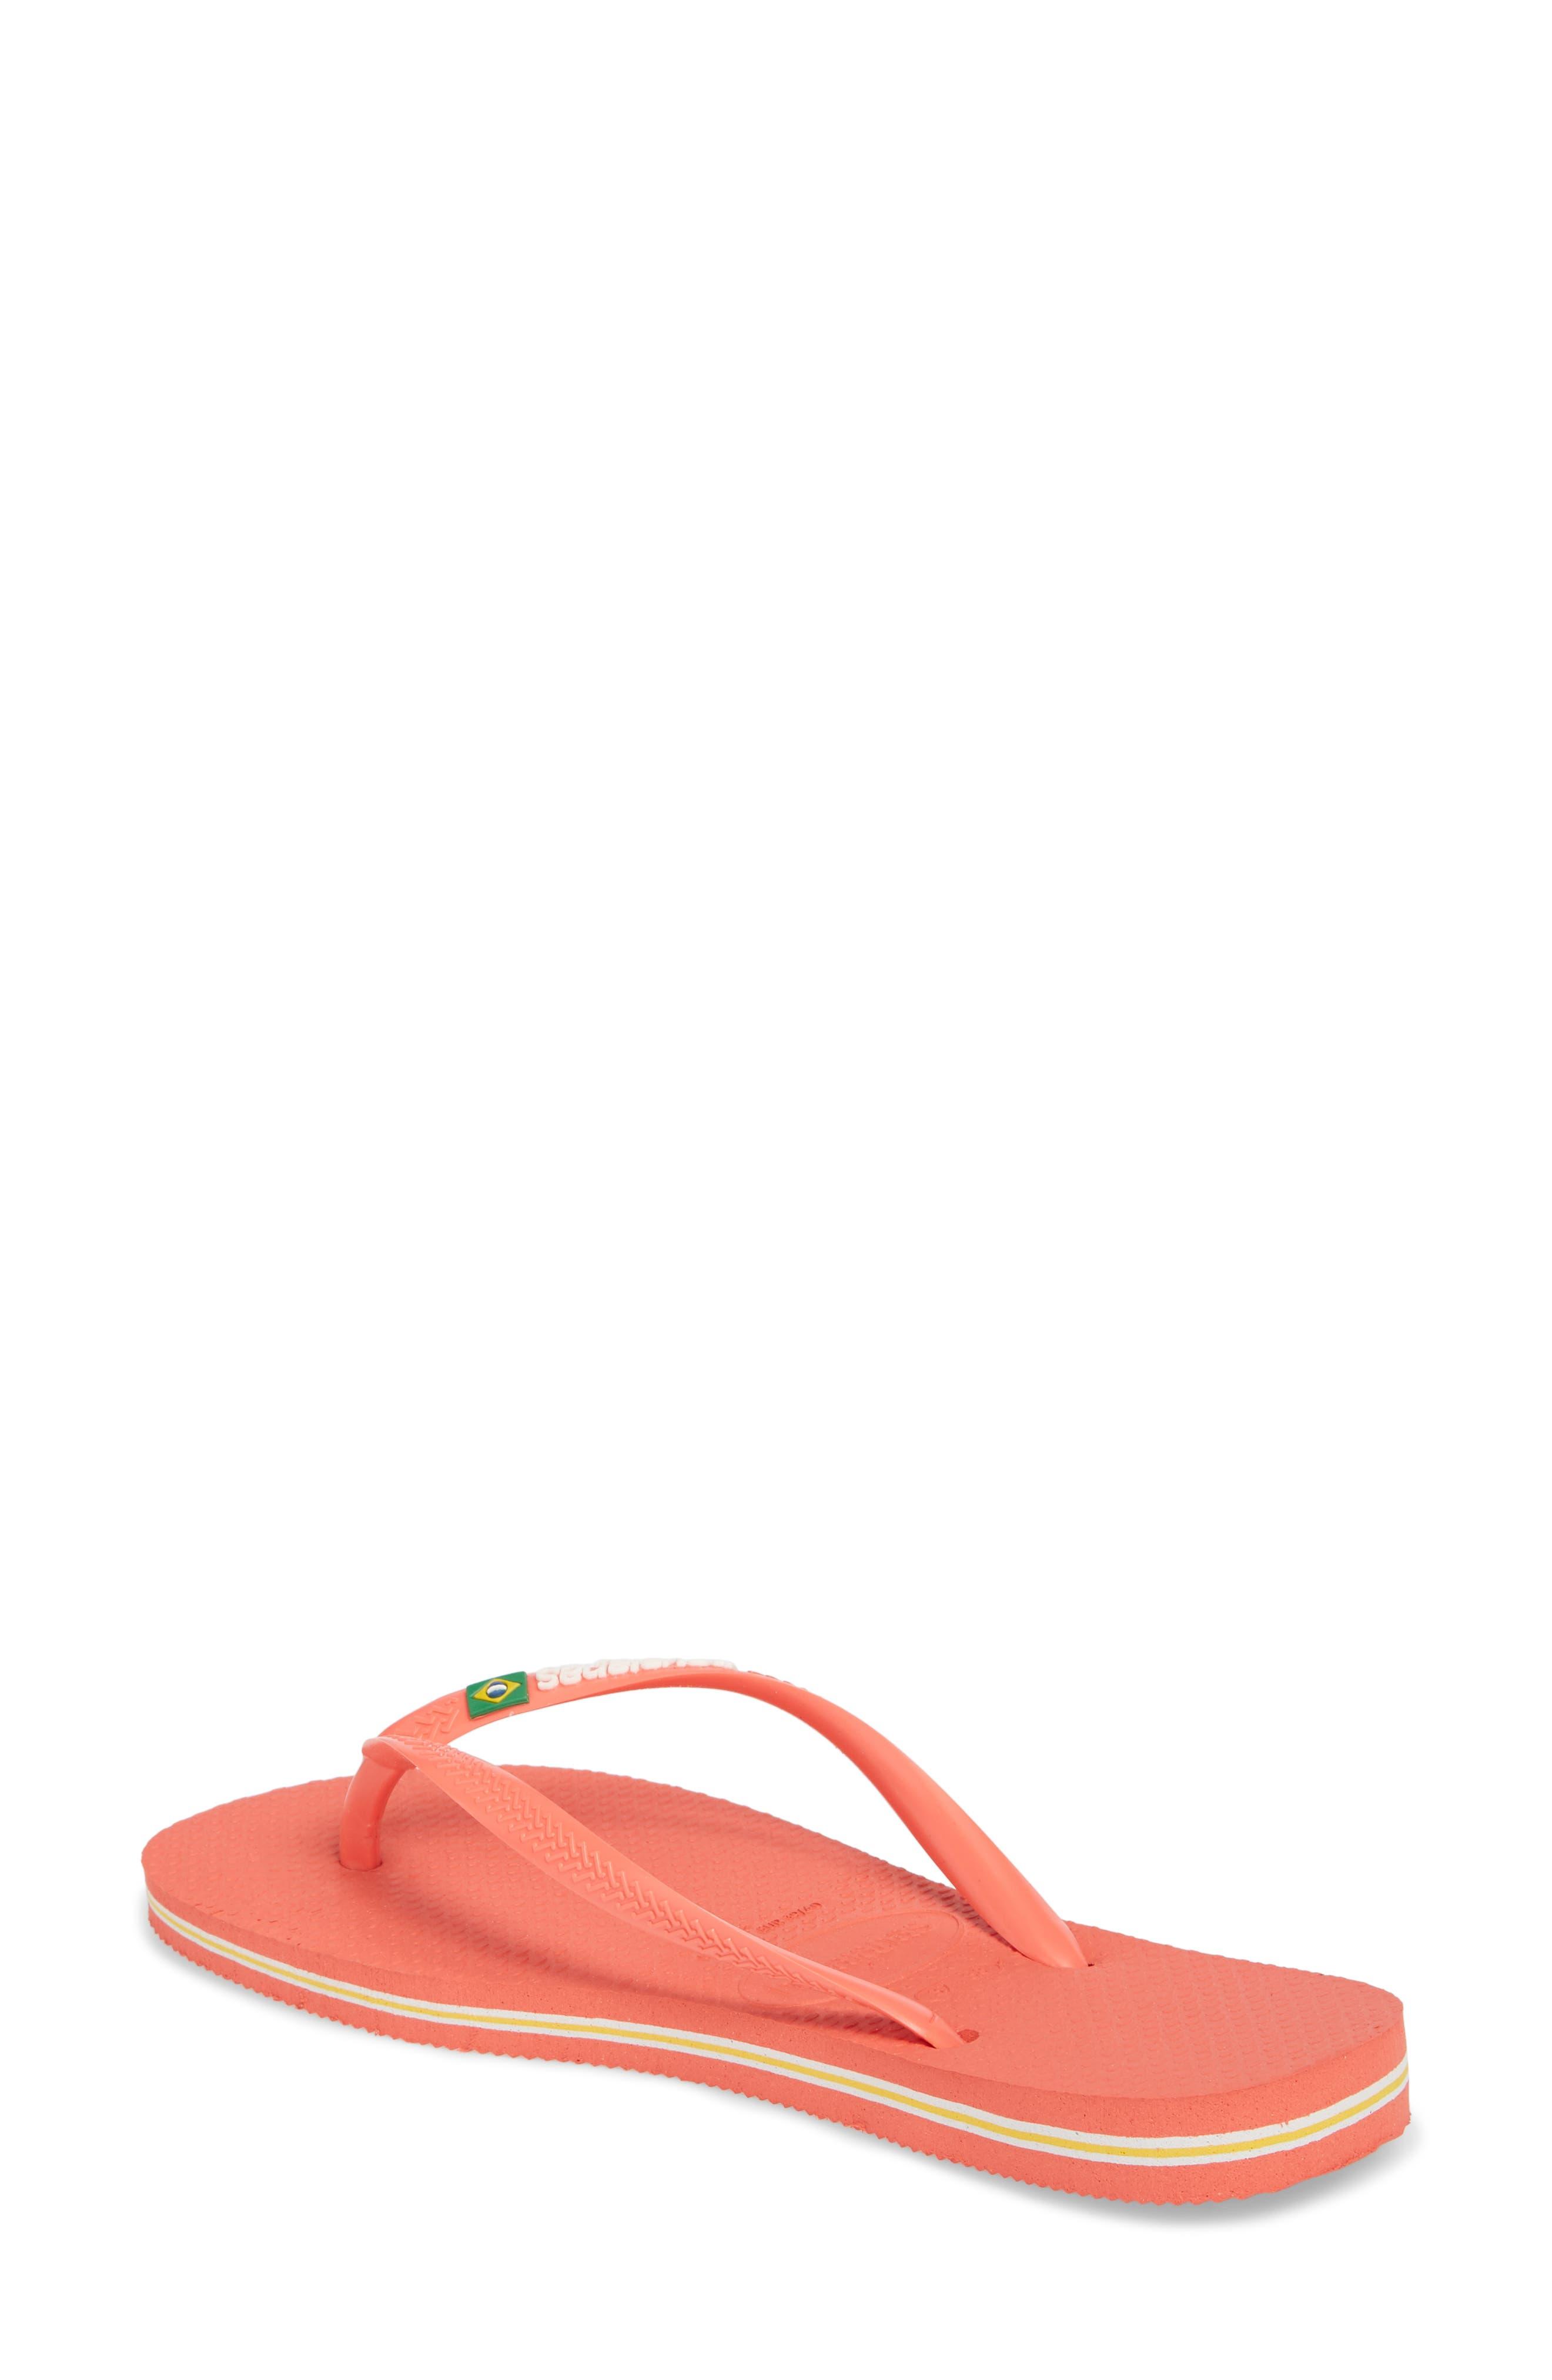 Havianas Slim Brazil Flip Flop,                             Alternate thumbnail 2, color,                             Coral